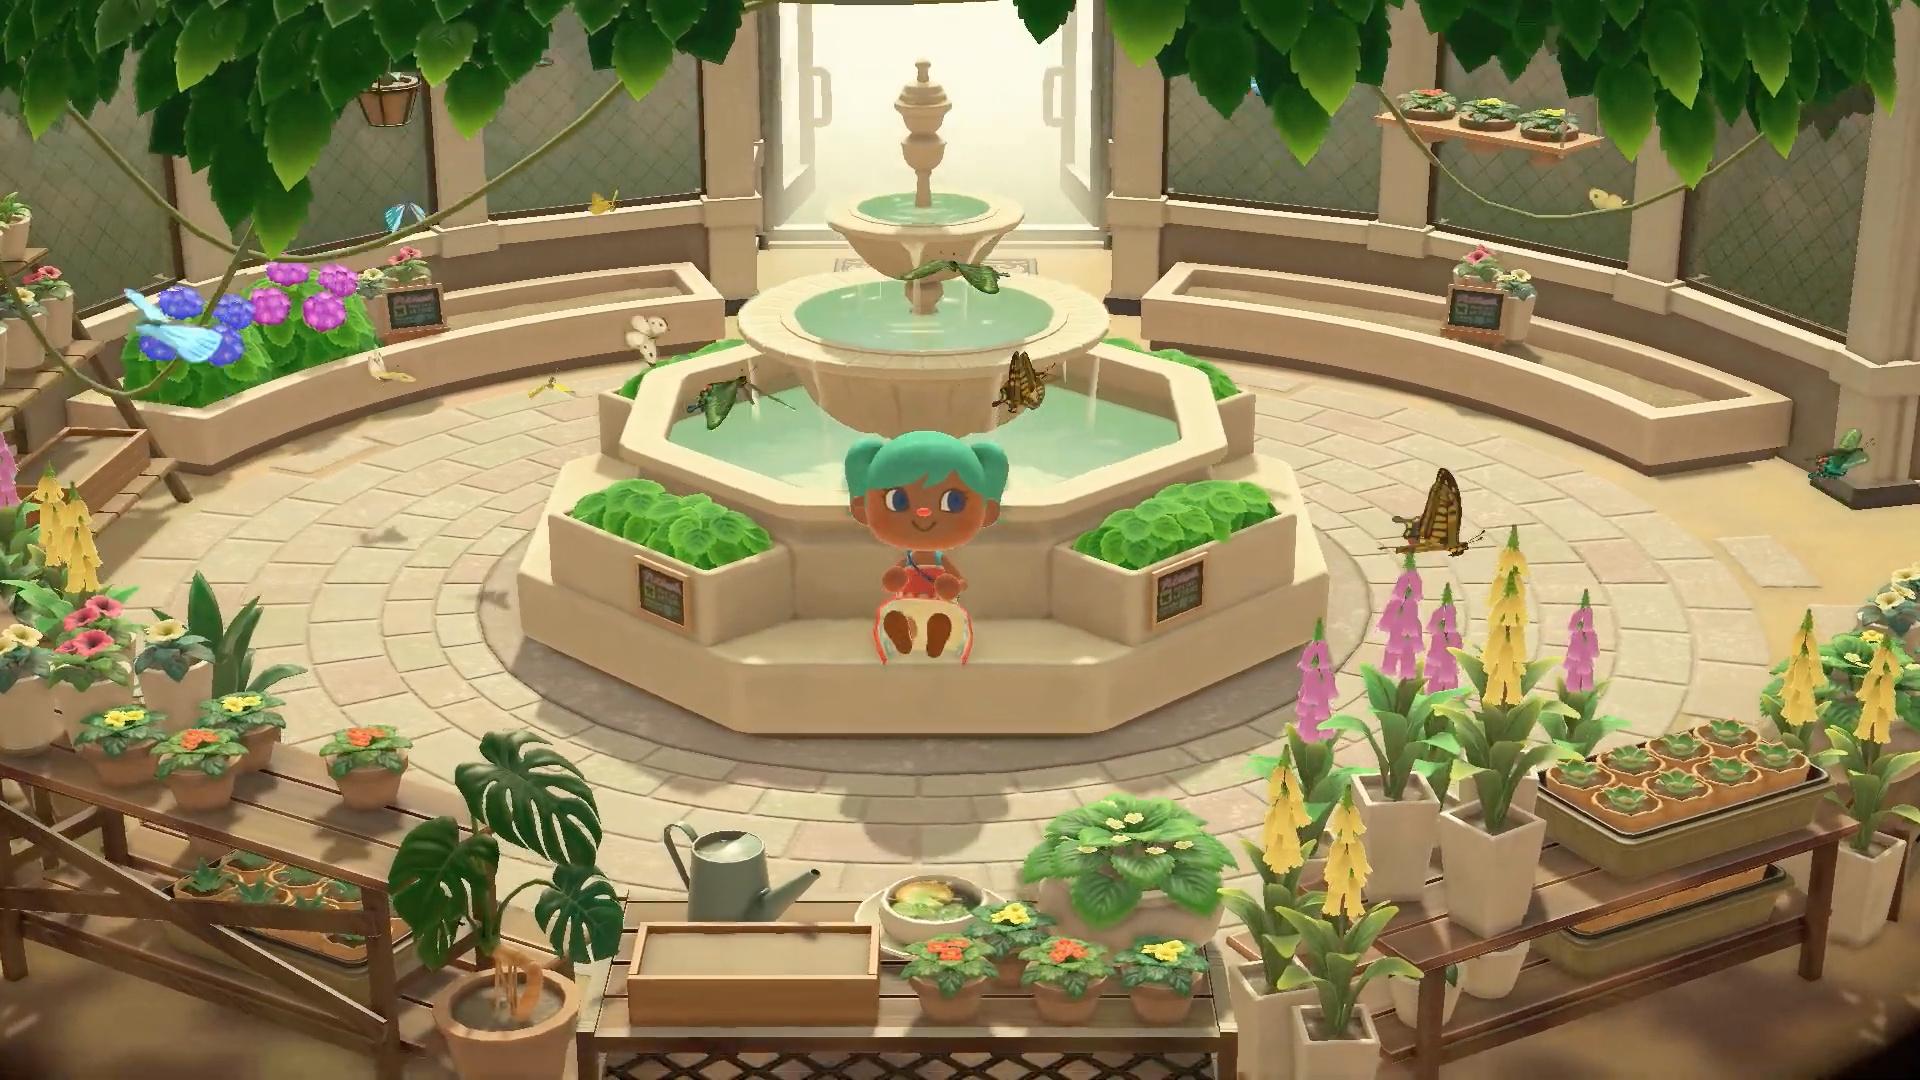 Gallery: Take A Peek Inside Animal Crossing: New Horizons ...